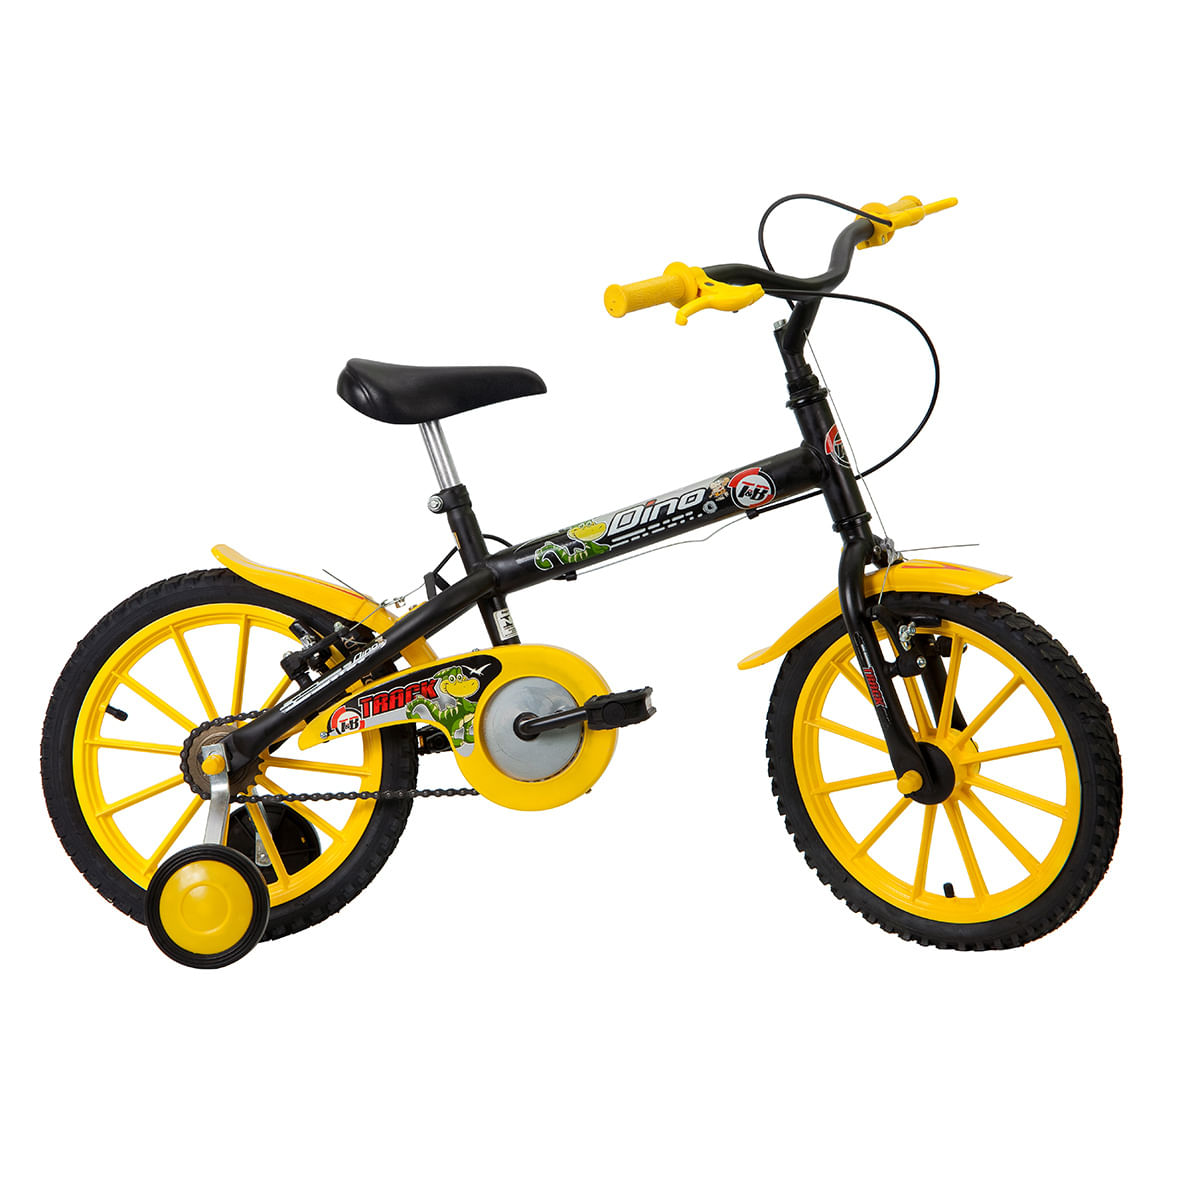 Bicicleta Track&bikes Dino Aro 16 Rígida 1 Marcha - Amarelo/preto